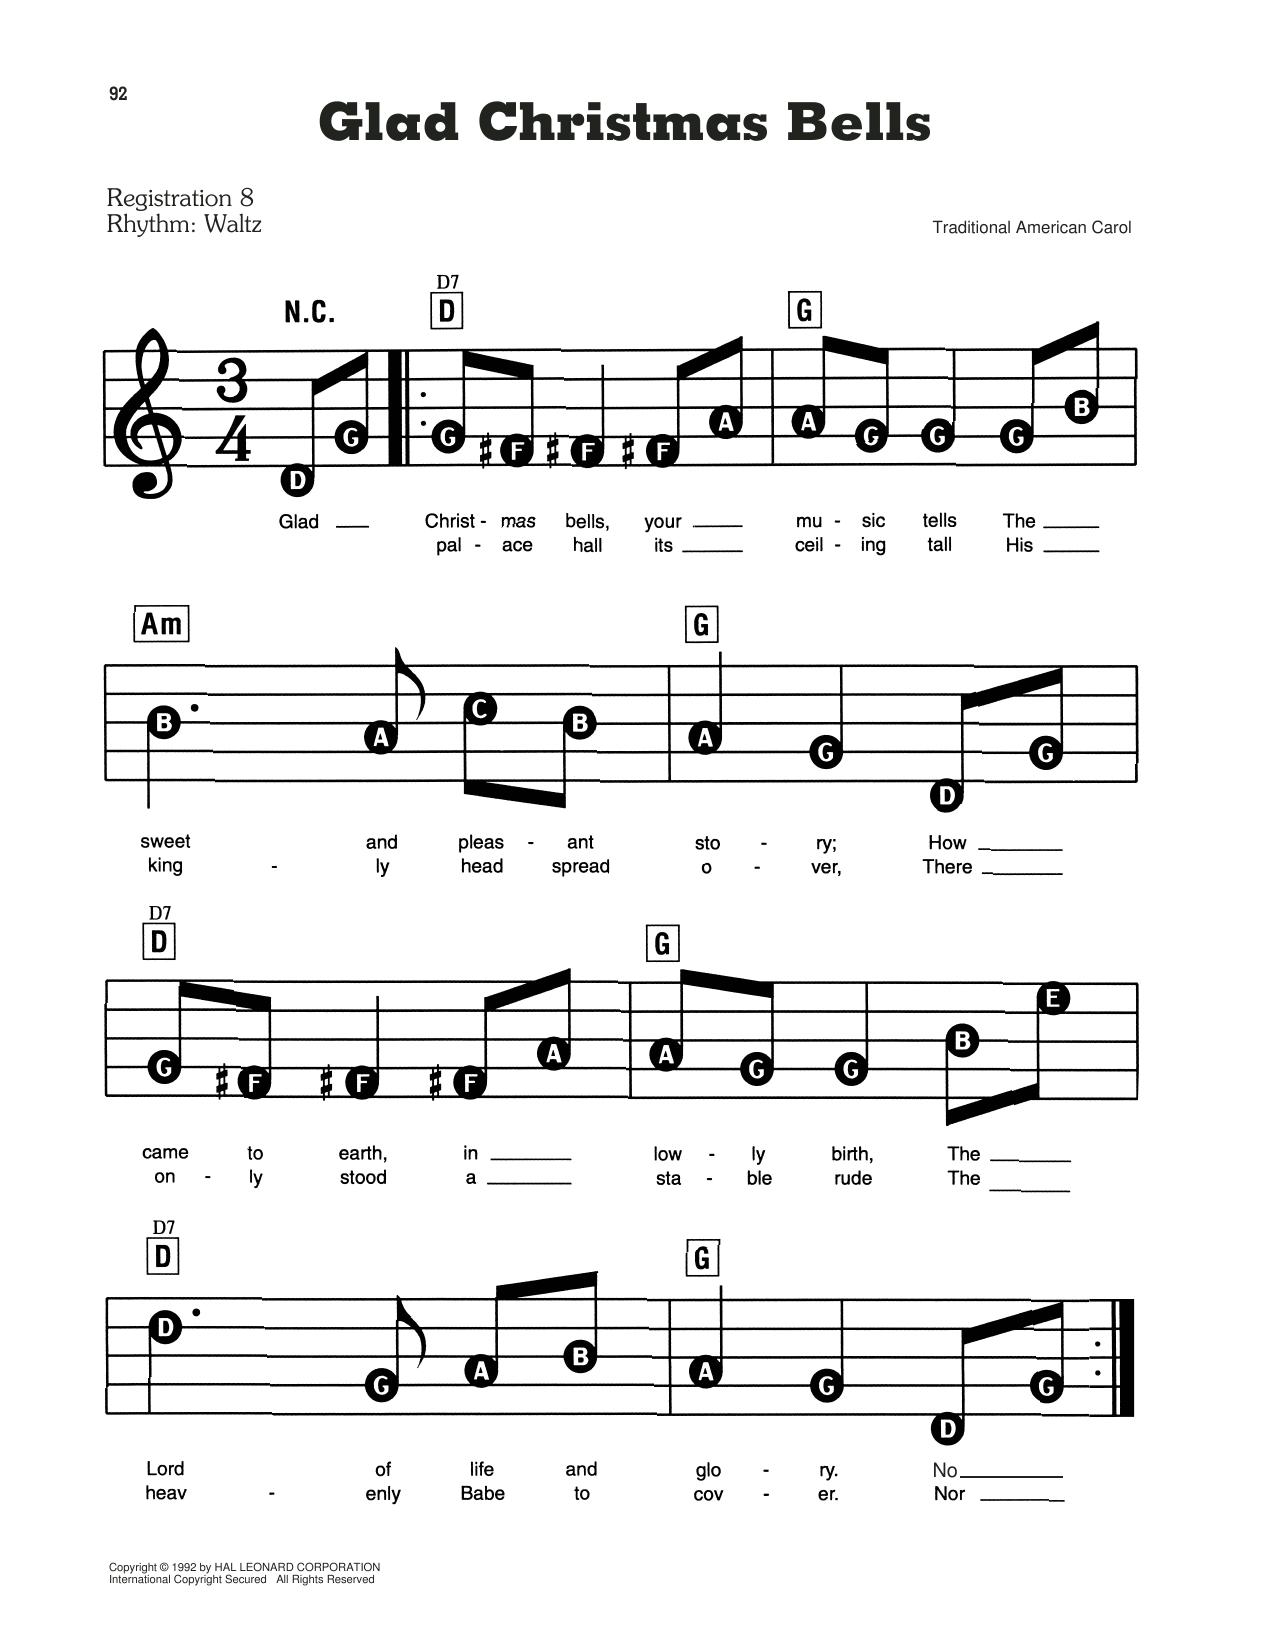 Traditional Carol Glad Christmas Bells Sheet Music Notes, Chords   Download  Printable Easy Guitar Tab PDF Score   SKU 15